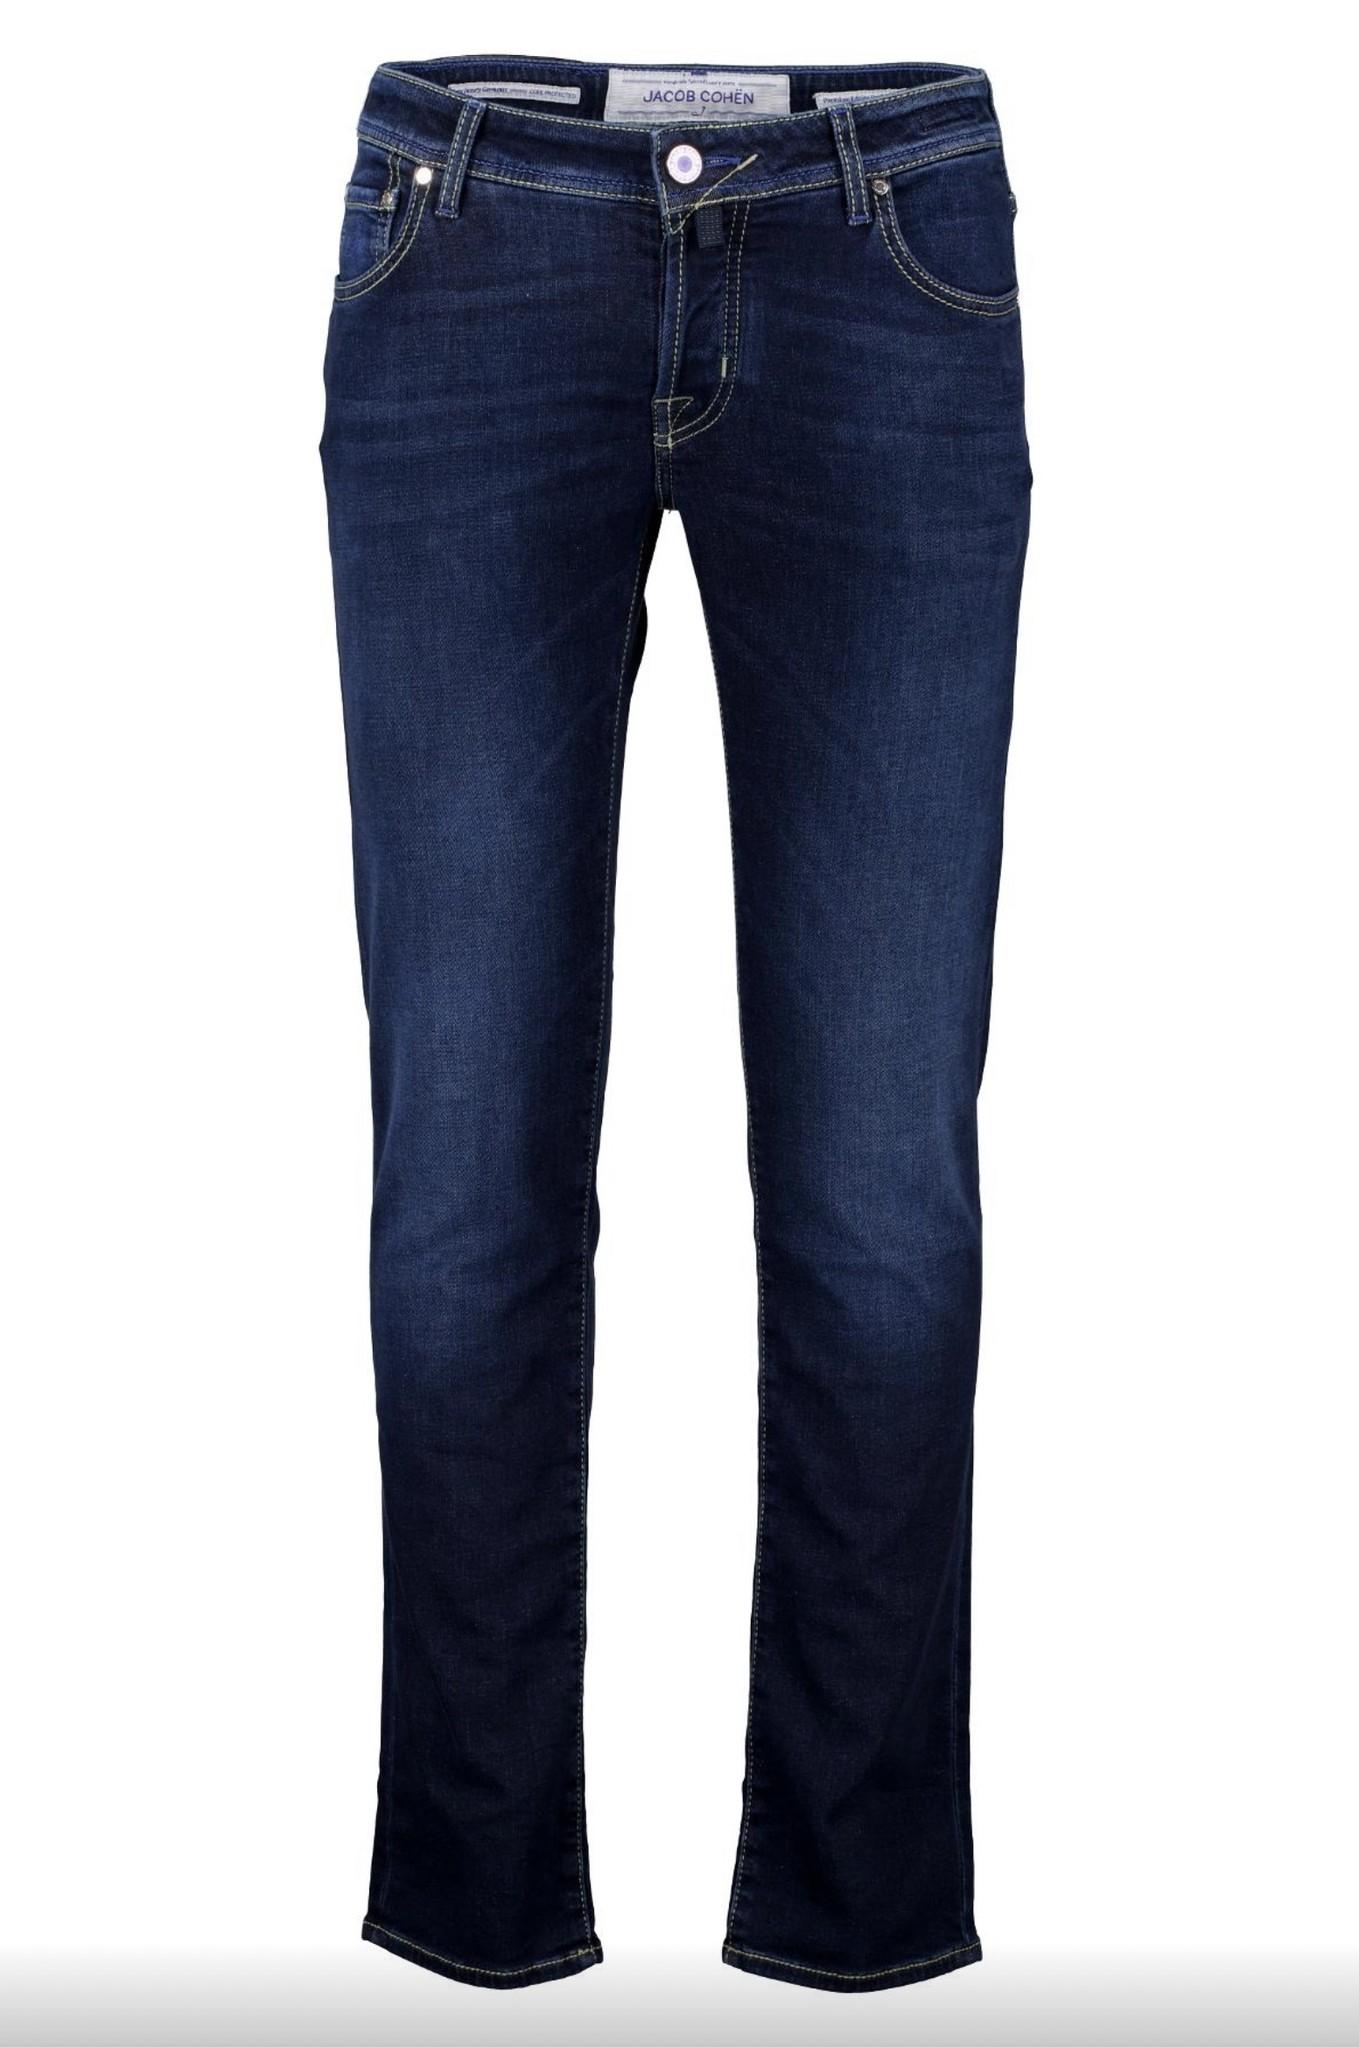 J622 Slim Jogging Comf Jeans-1